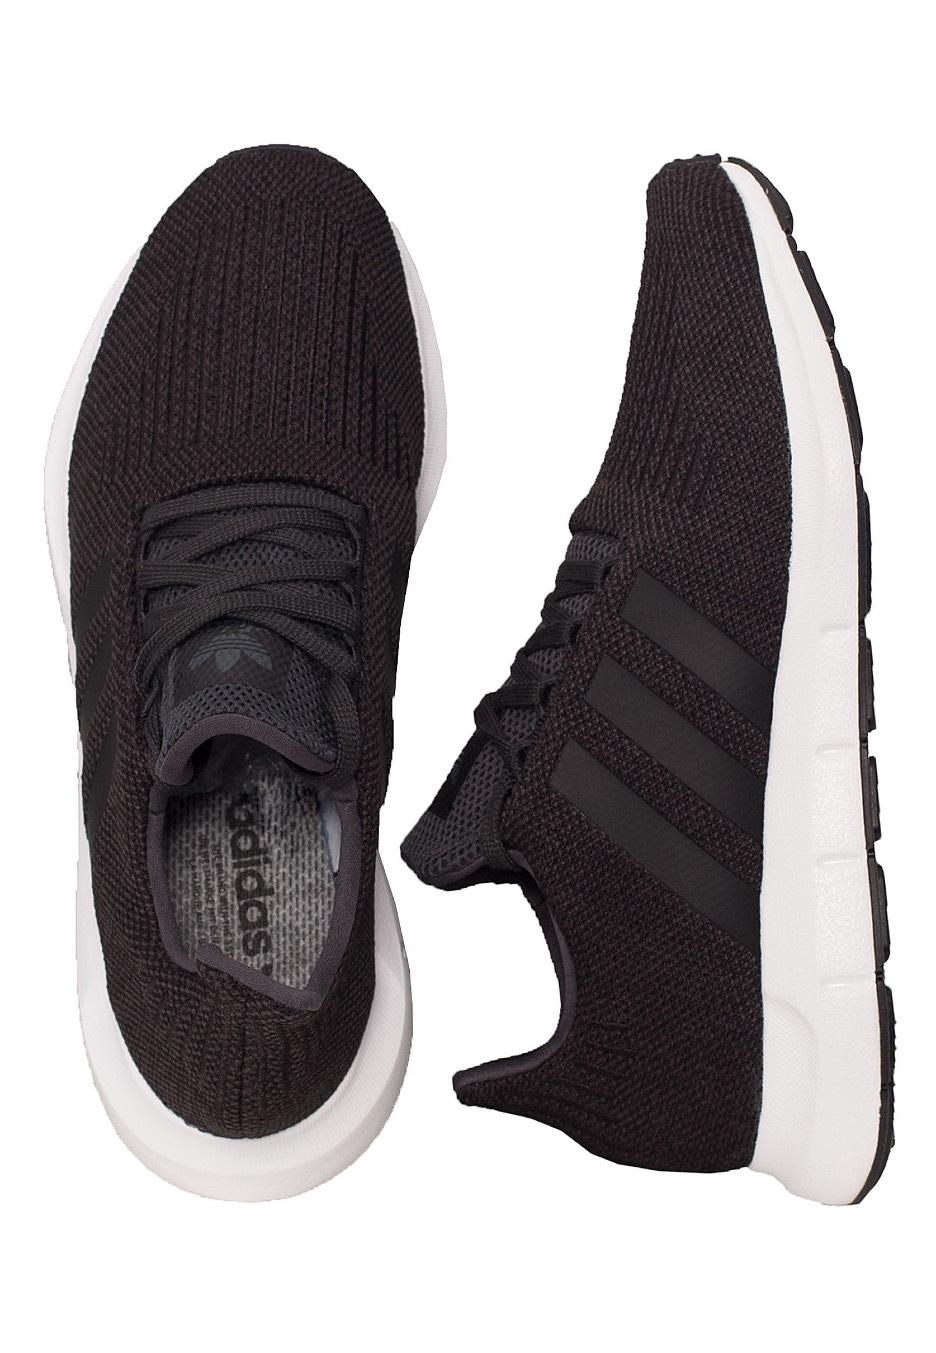 b673d630ecc6 Adidas - Swift Run Carbon Core Black Medium Grey Heather - Shoes -  Impericon.com UK